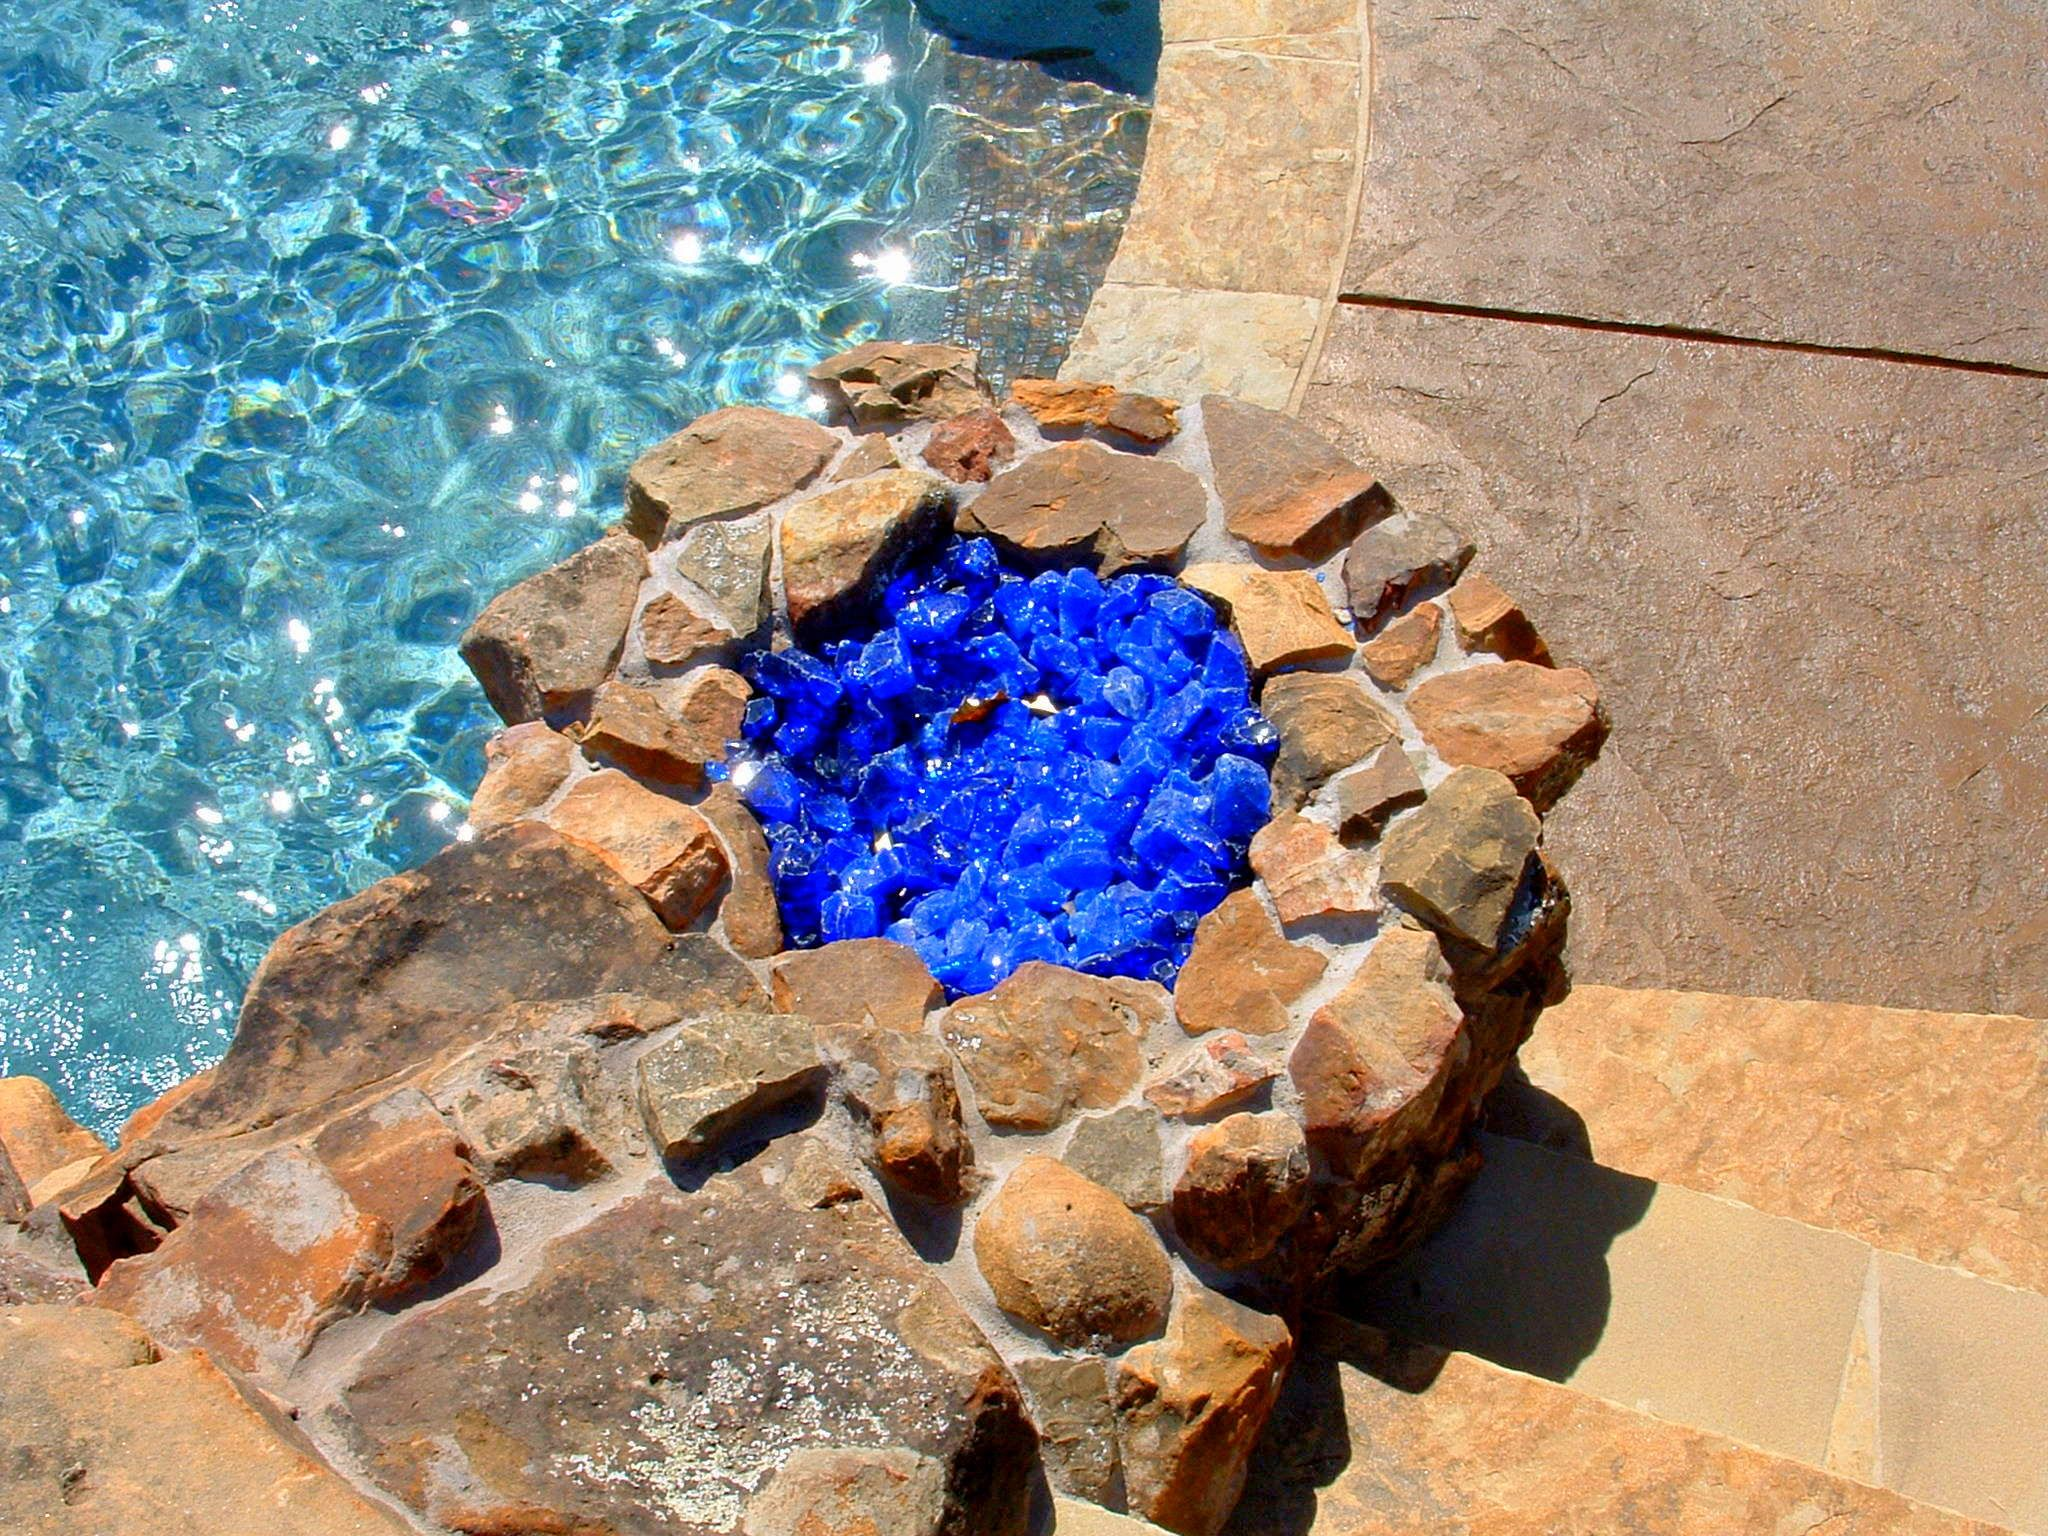 Fire Pit Glass Rocks